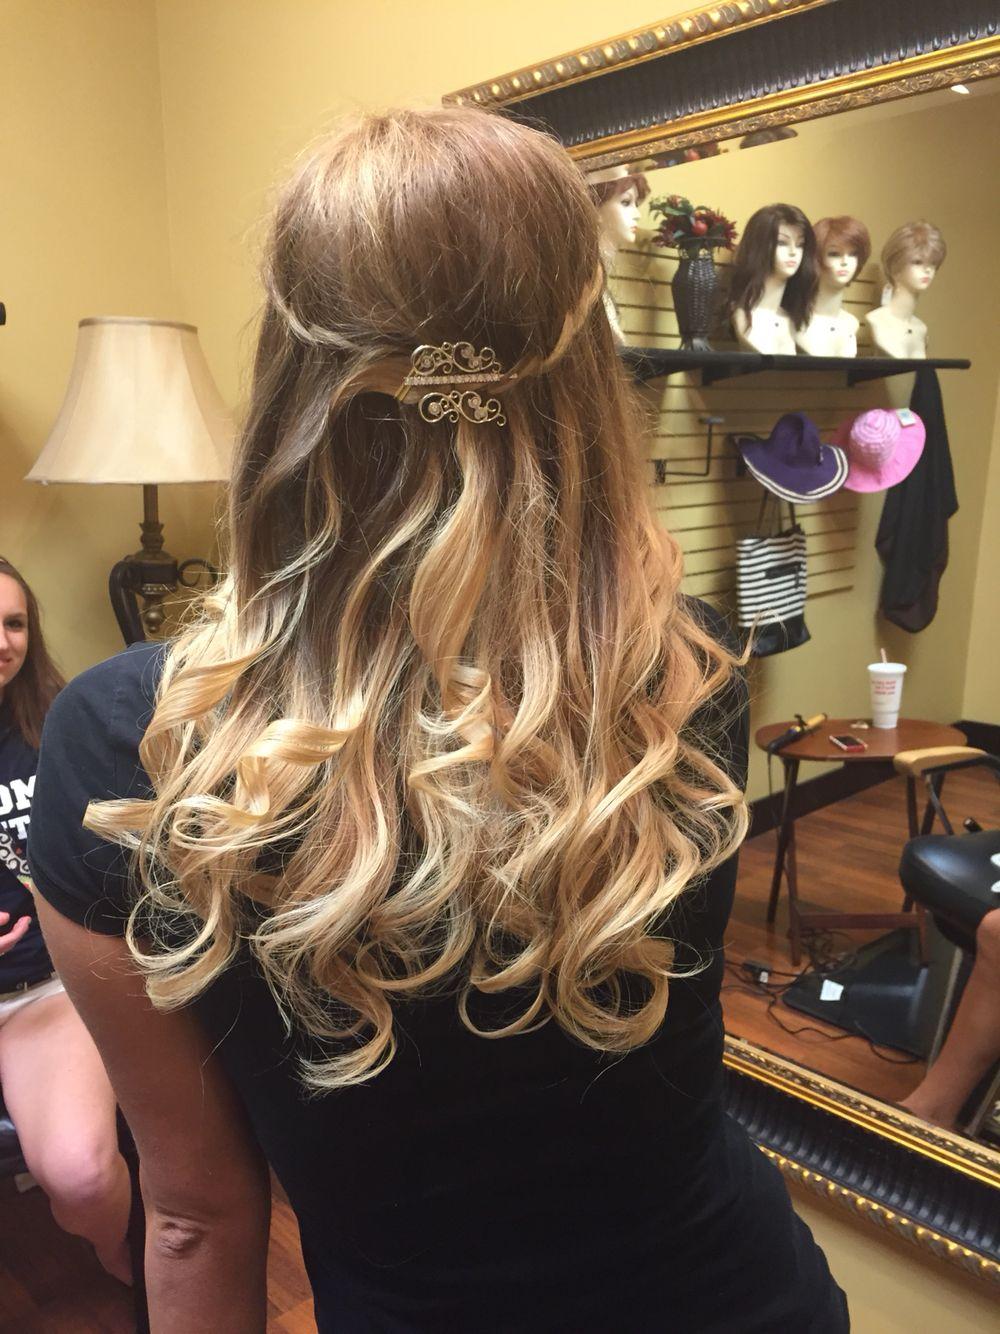 Prom hair #prom